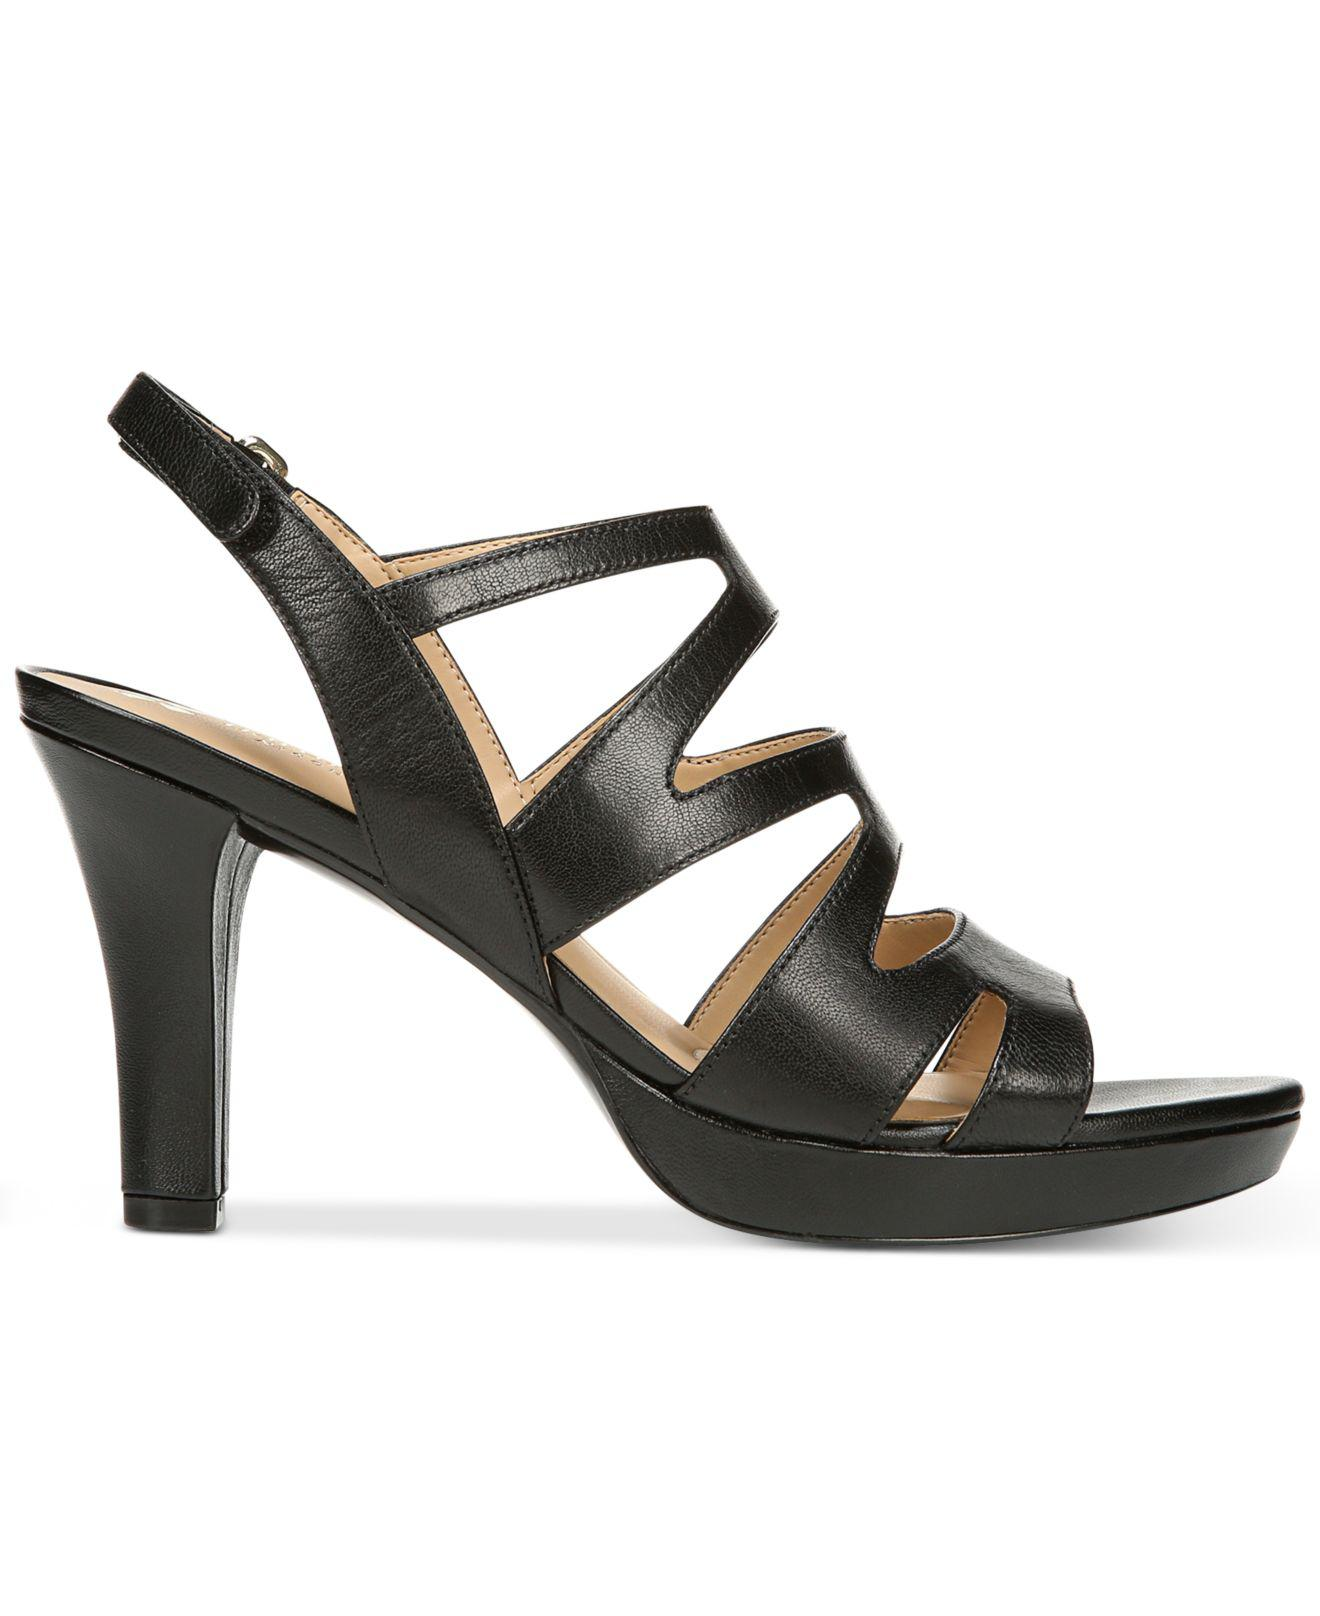 f930a1c088b3 Lyst - Naturalizer Pressley Sandals in Black